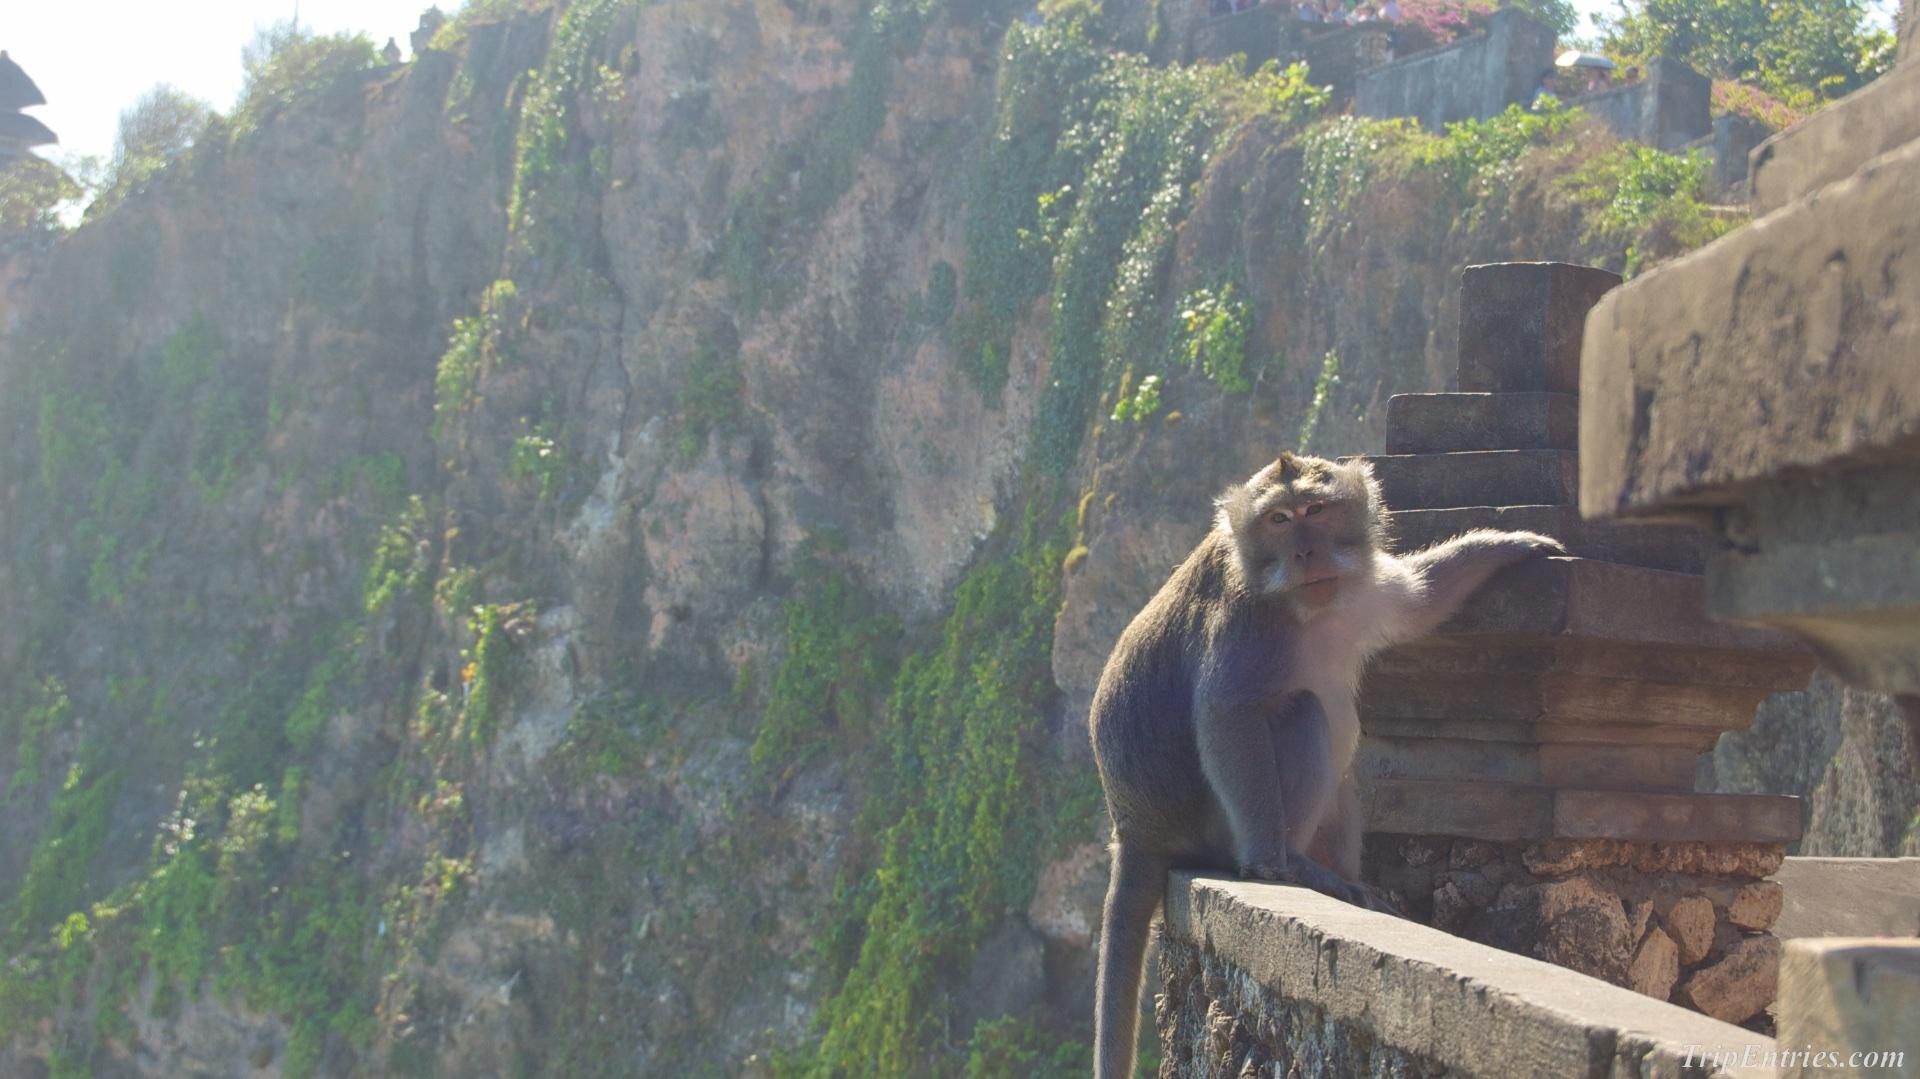 Храм Улувату - Uluwatu Temple и обезьянки